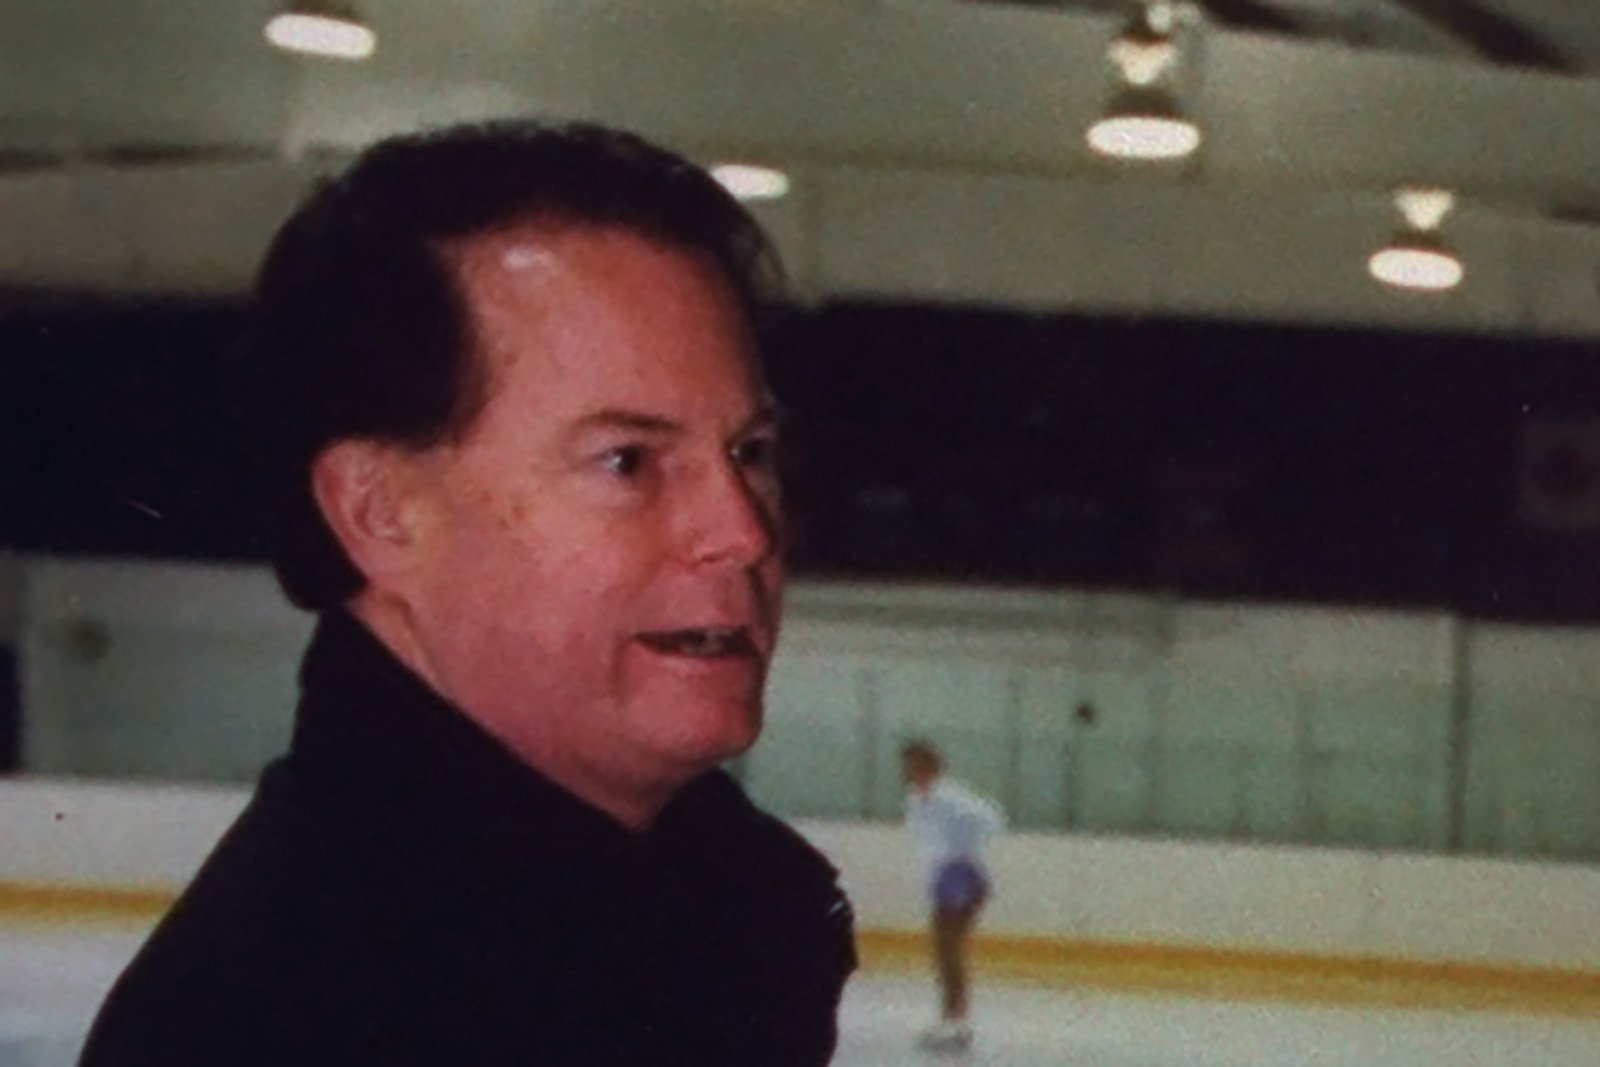 Longtime U.S. Figure Skating coach Richard Callaghan appears in an undated photo. (Credit: Taro Yamasaki/Getty Images via CNN)